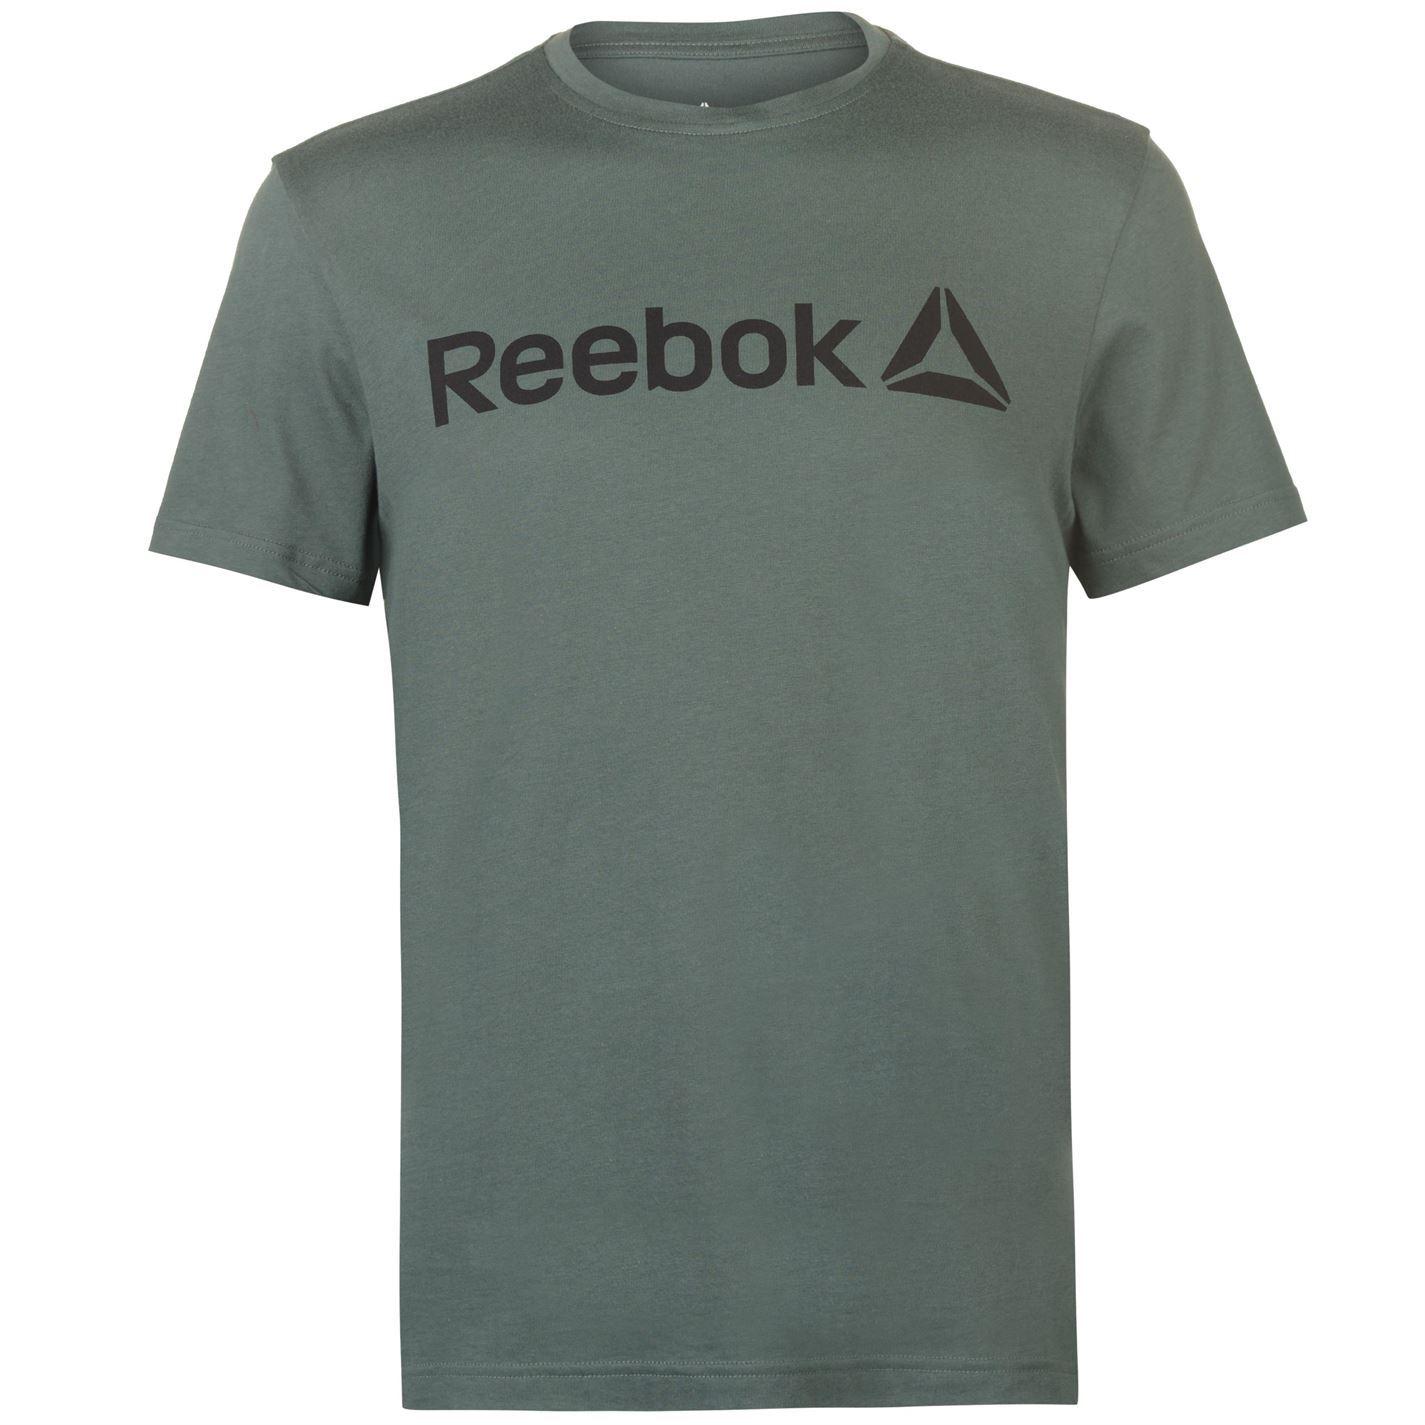 Reebok-Delta-Logo-T-Shirt-Mens-Tee-Shirt-Top thumbnail 19